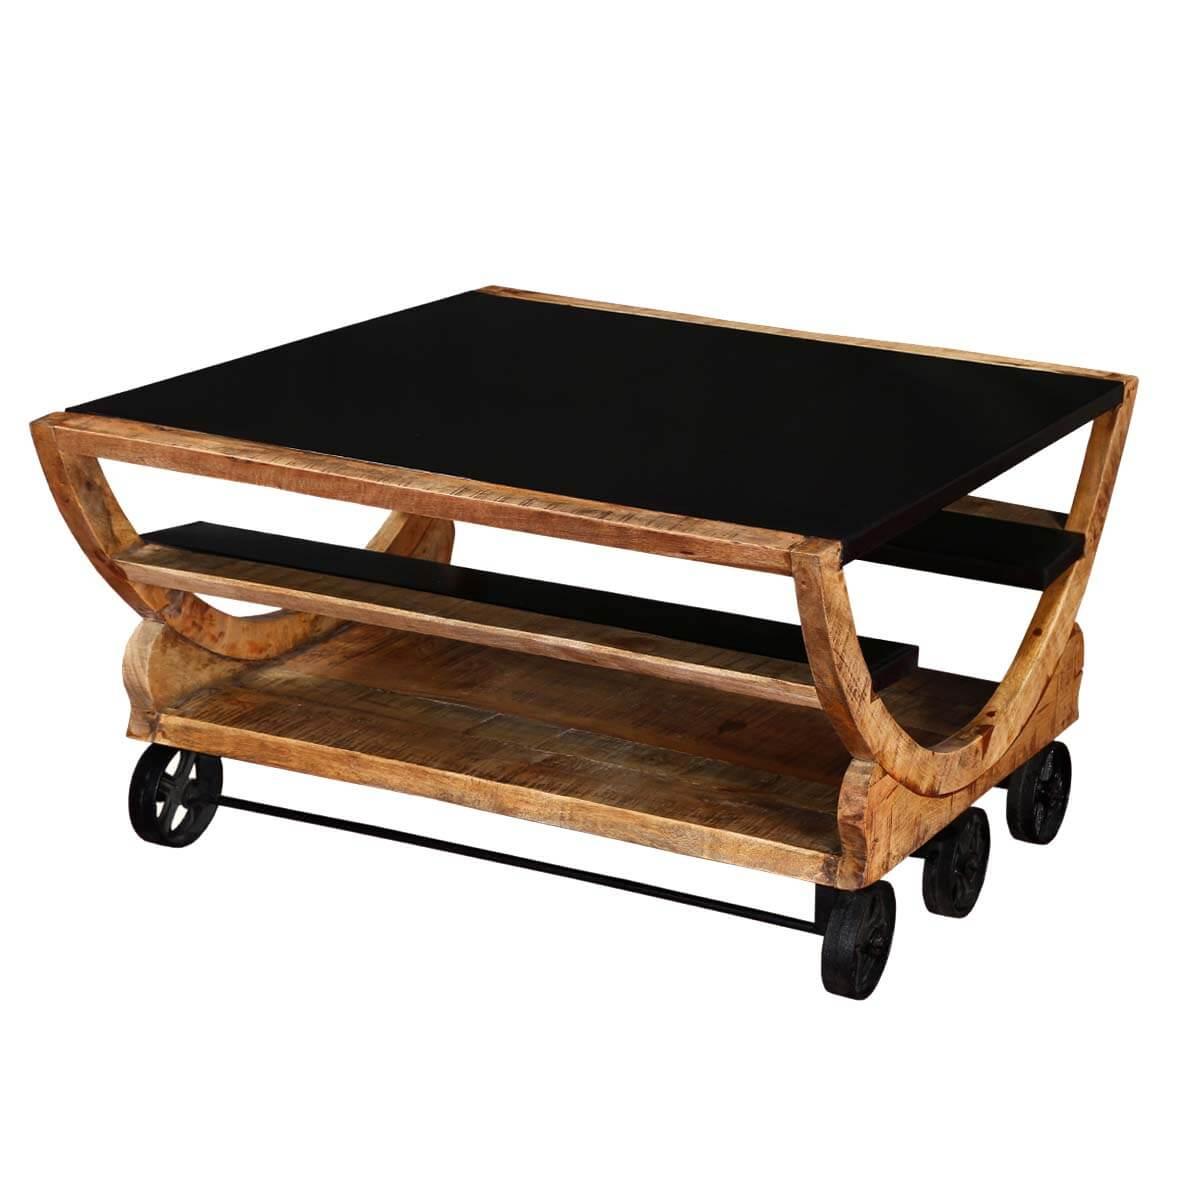 Savannah 3 shelf with 6 wheels Iron & Wood Modern Accent Coffee Table